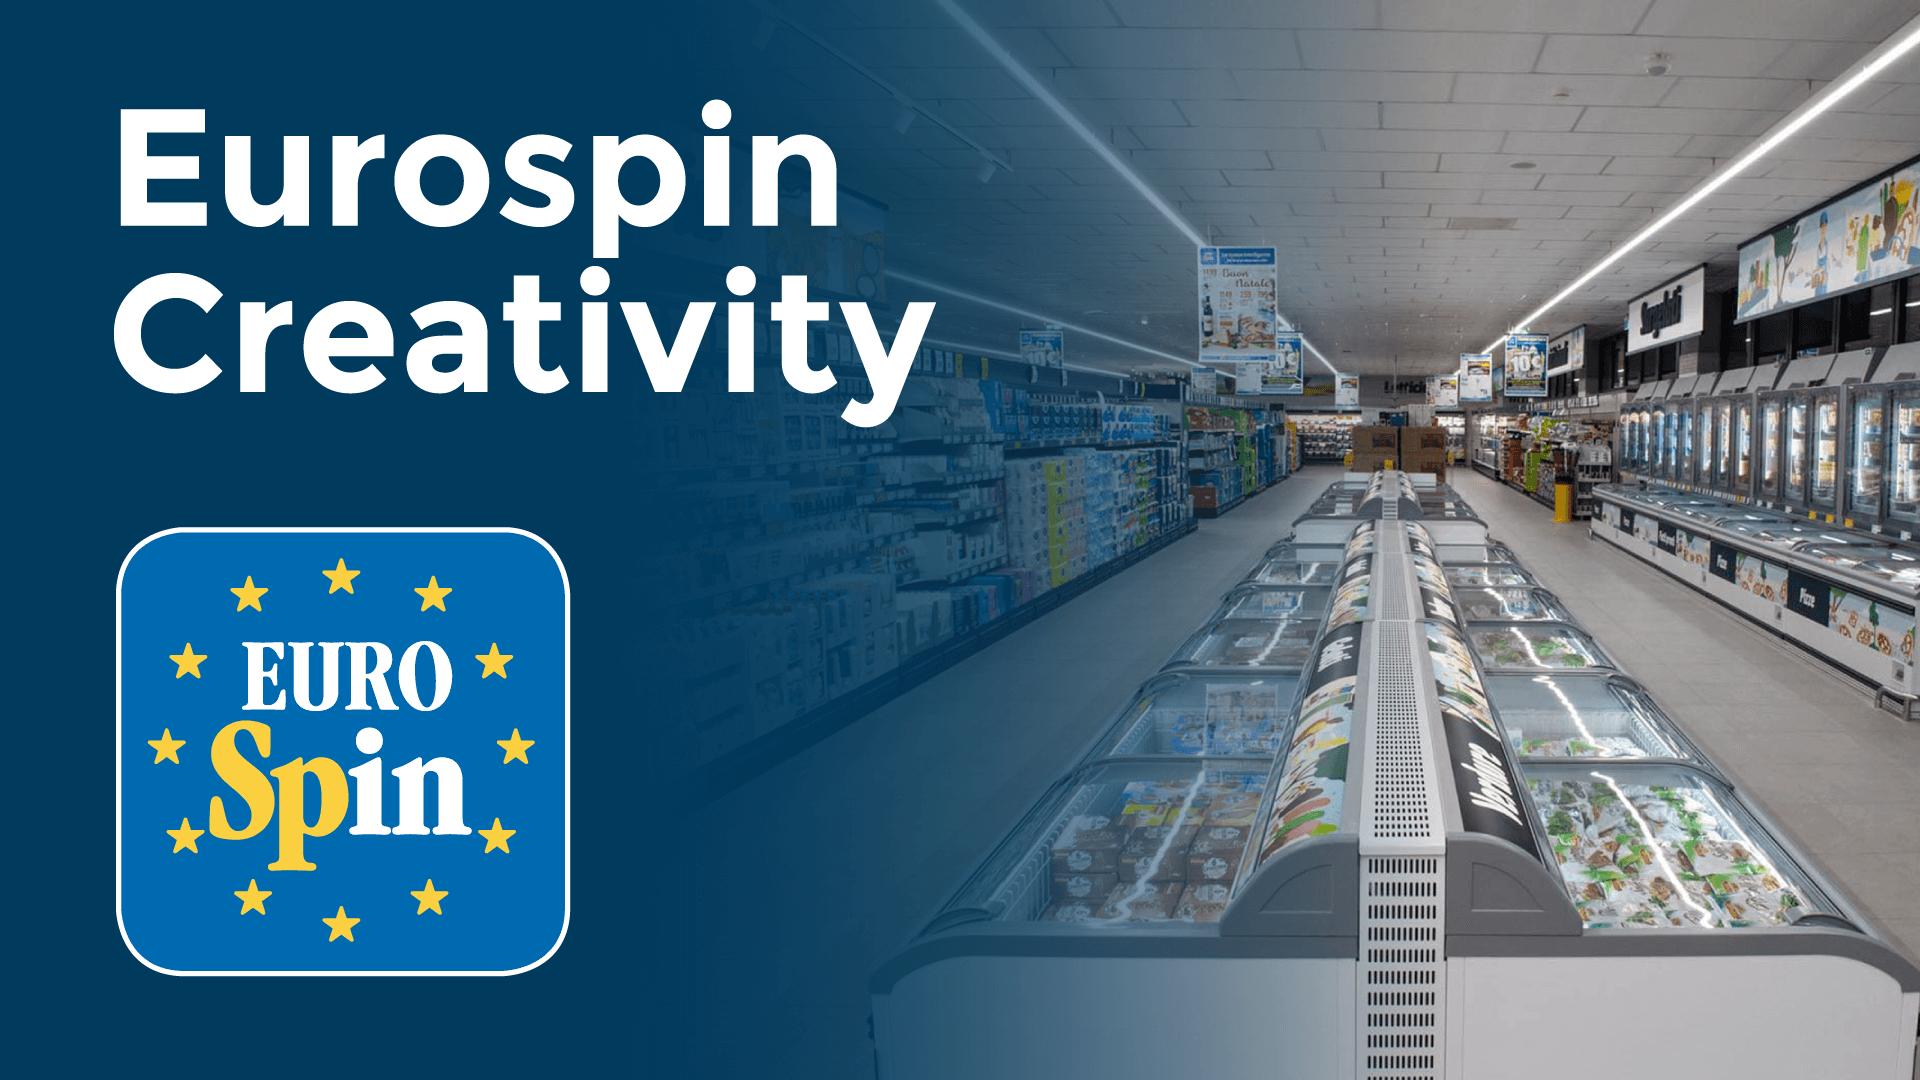 Eurospin Creativity